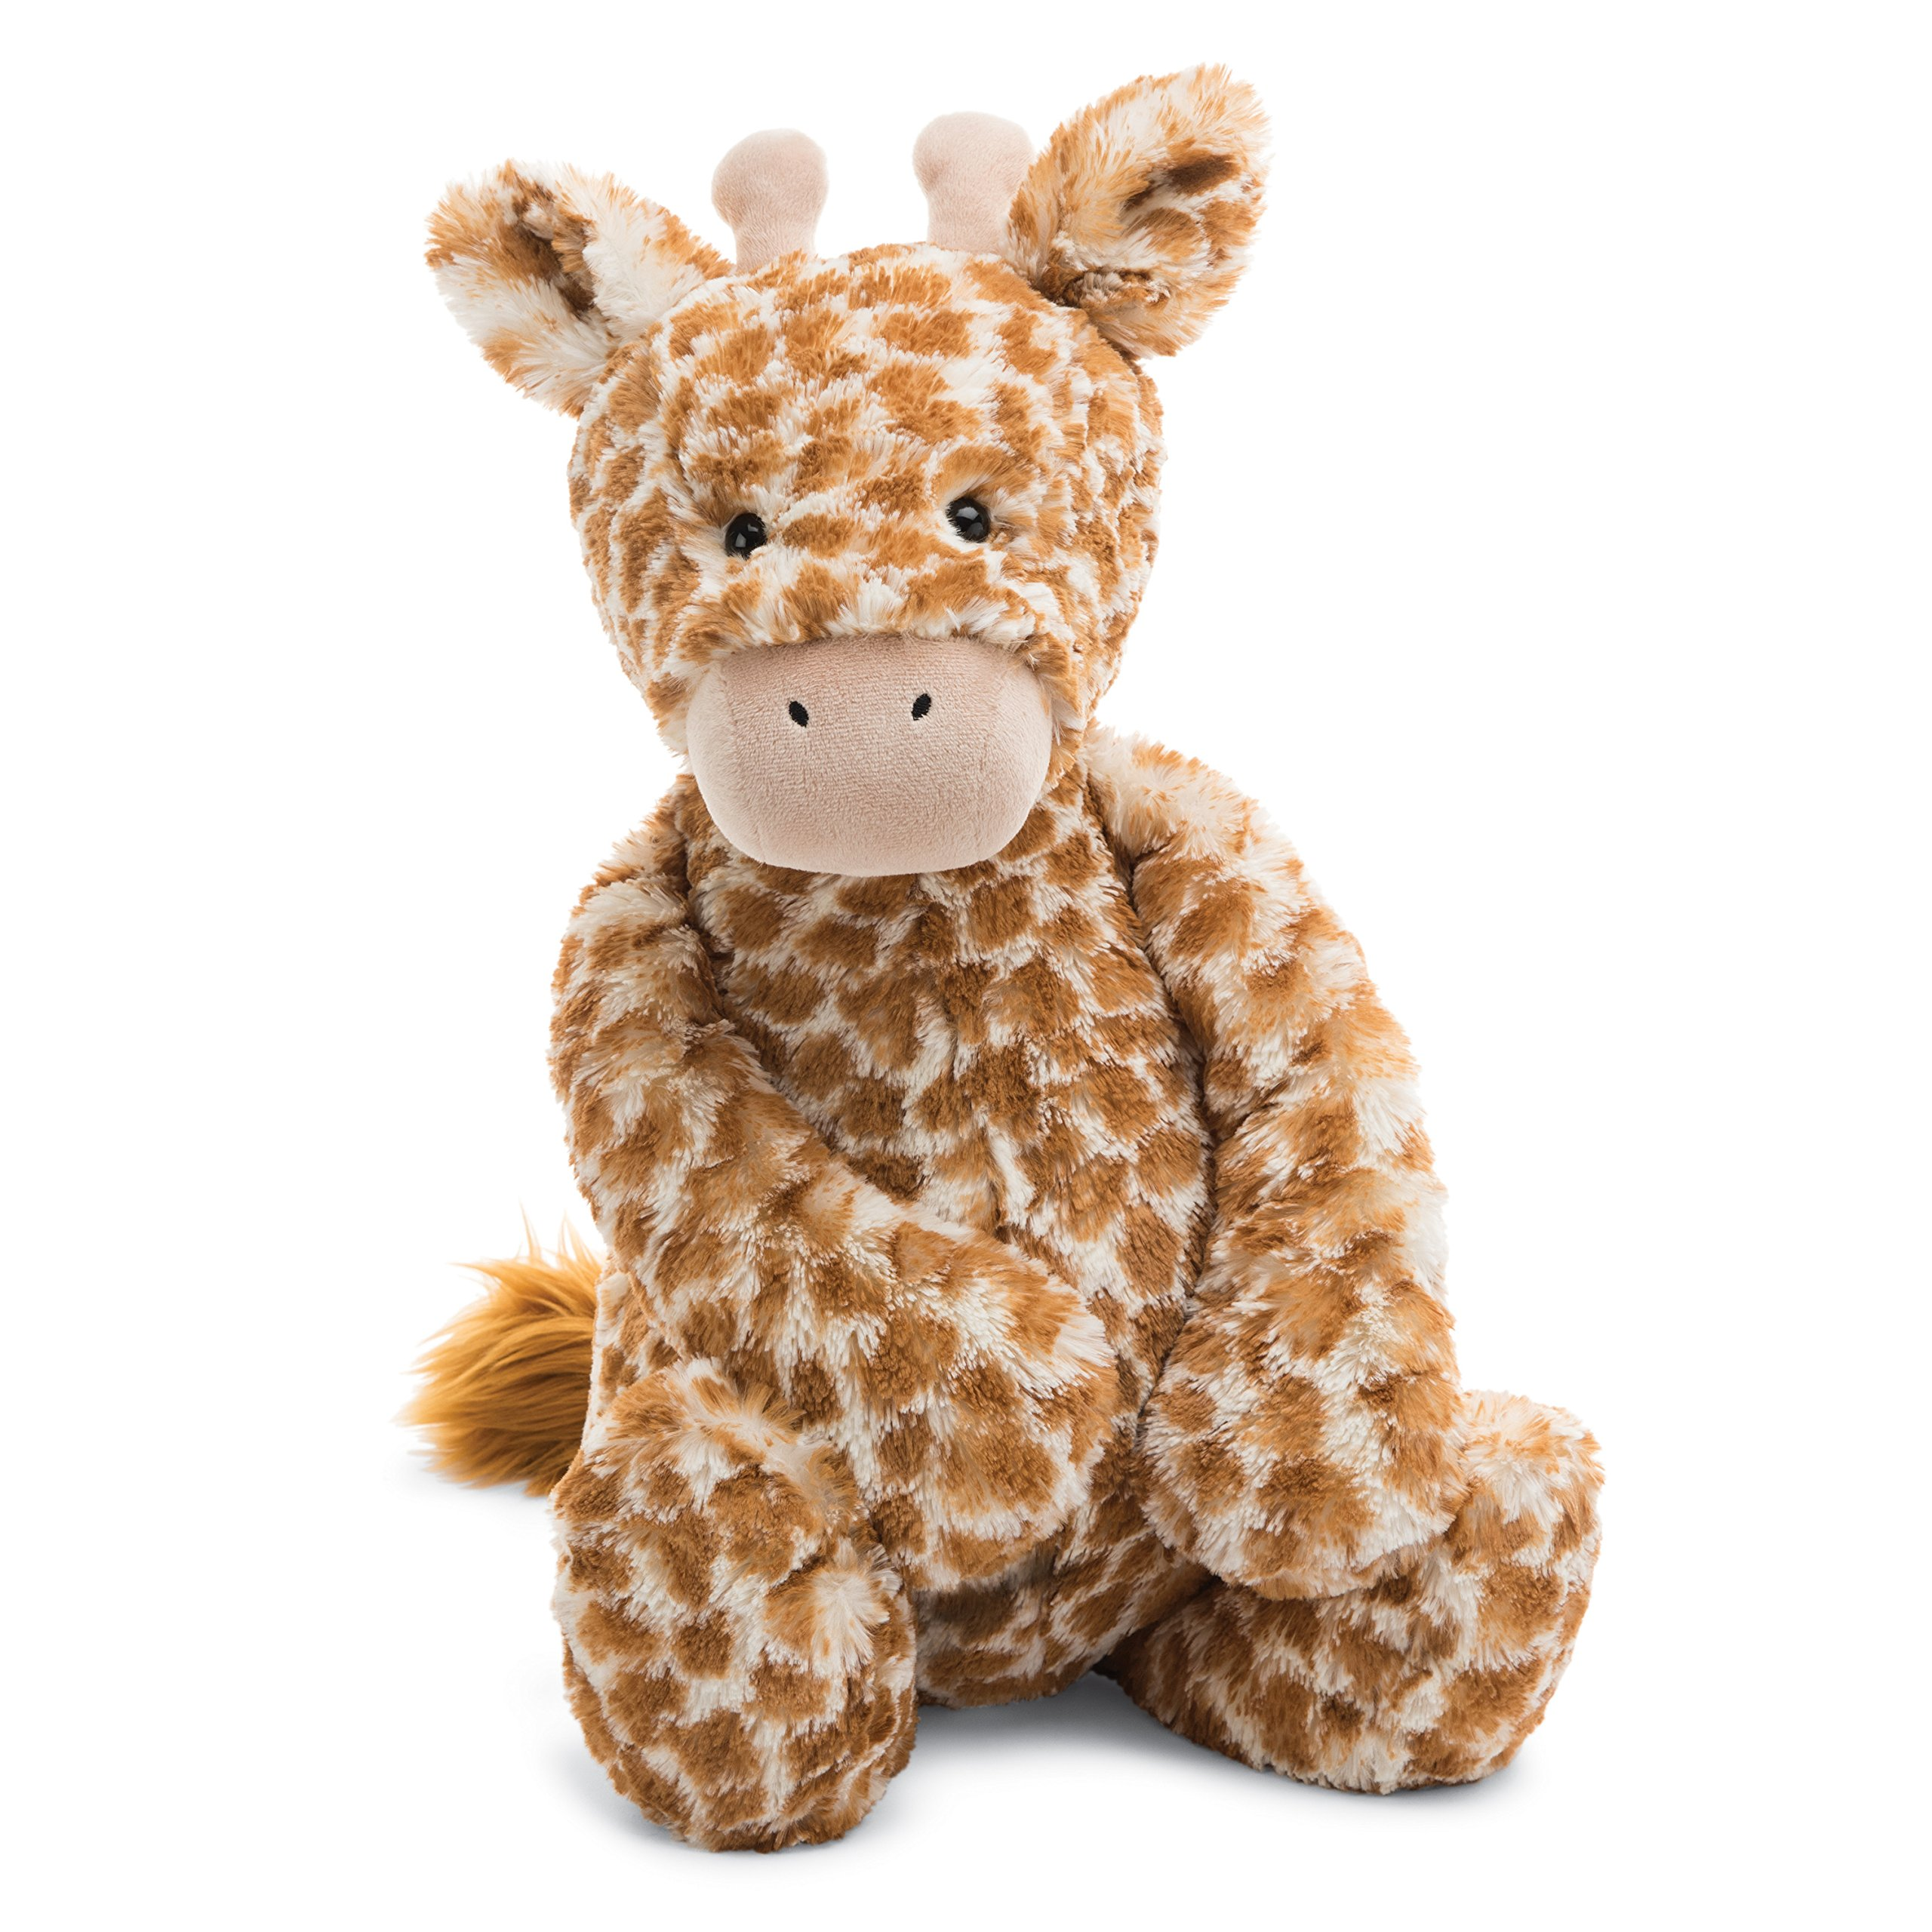 Jellycat Bashful Giraffe Stuffed Animal, Huge, 21 inches by Jellycat